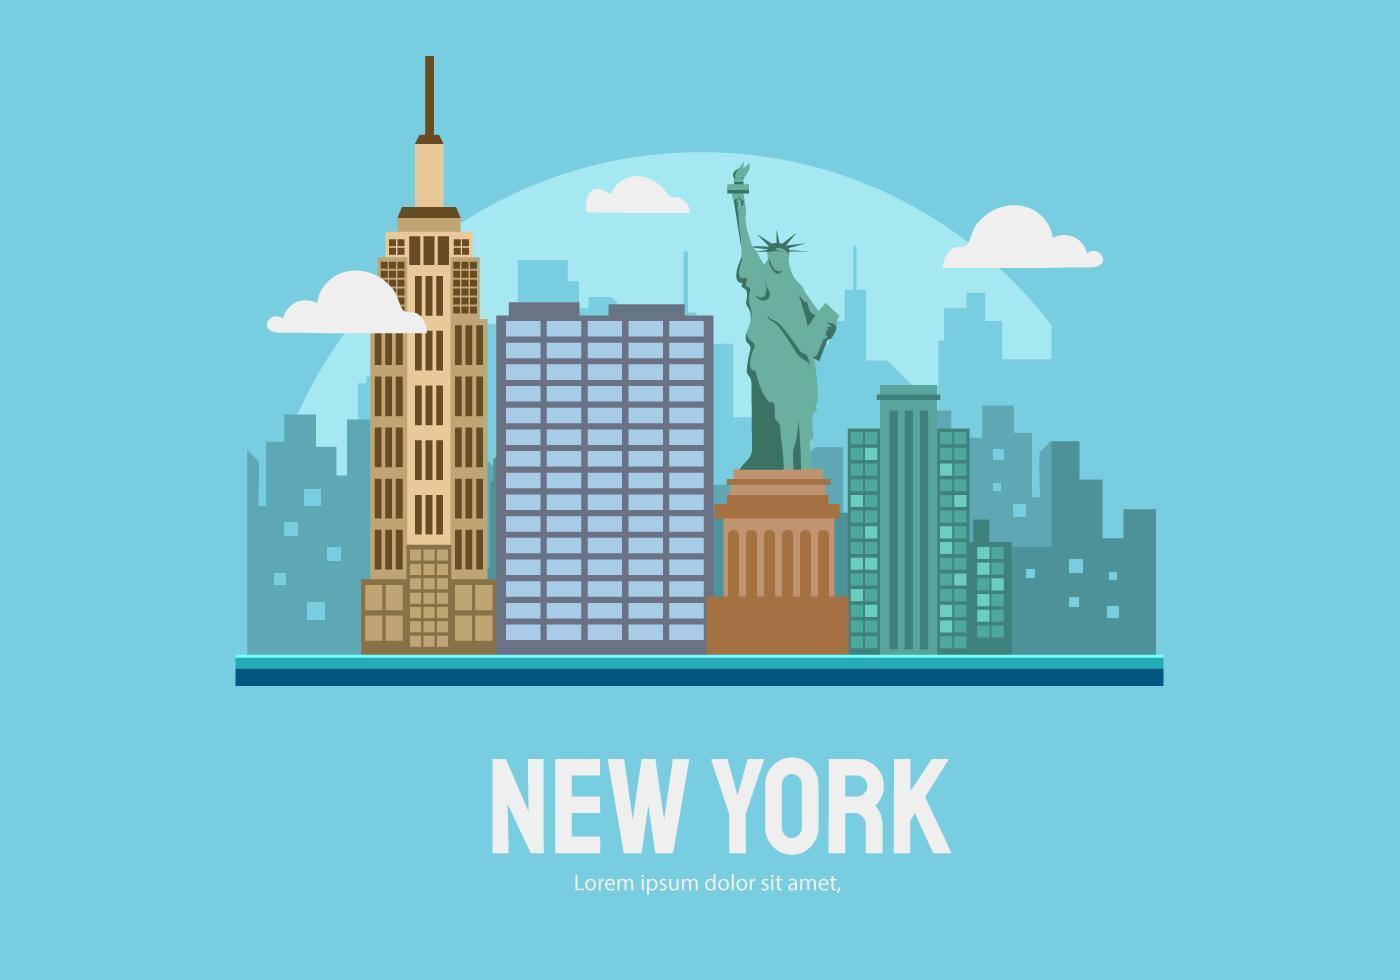 New York City Building Vector Flat Illustration